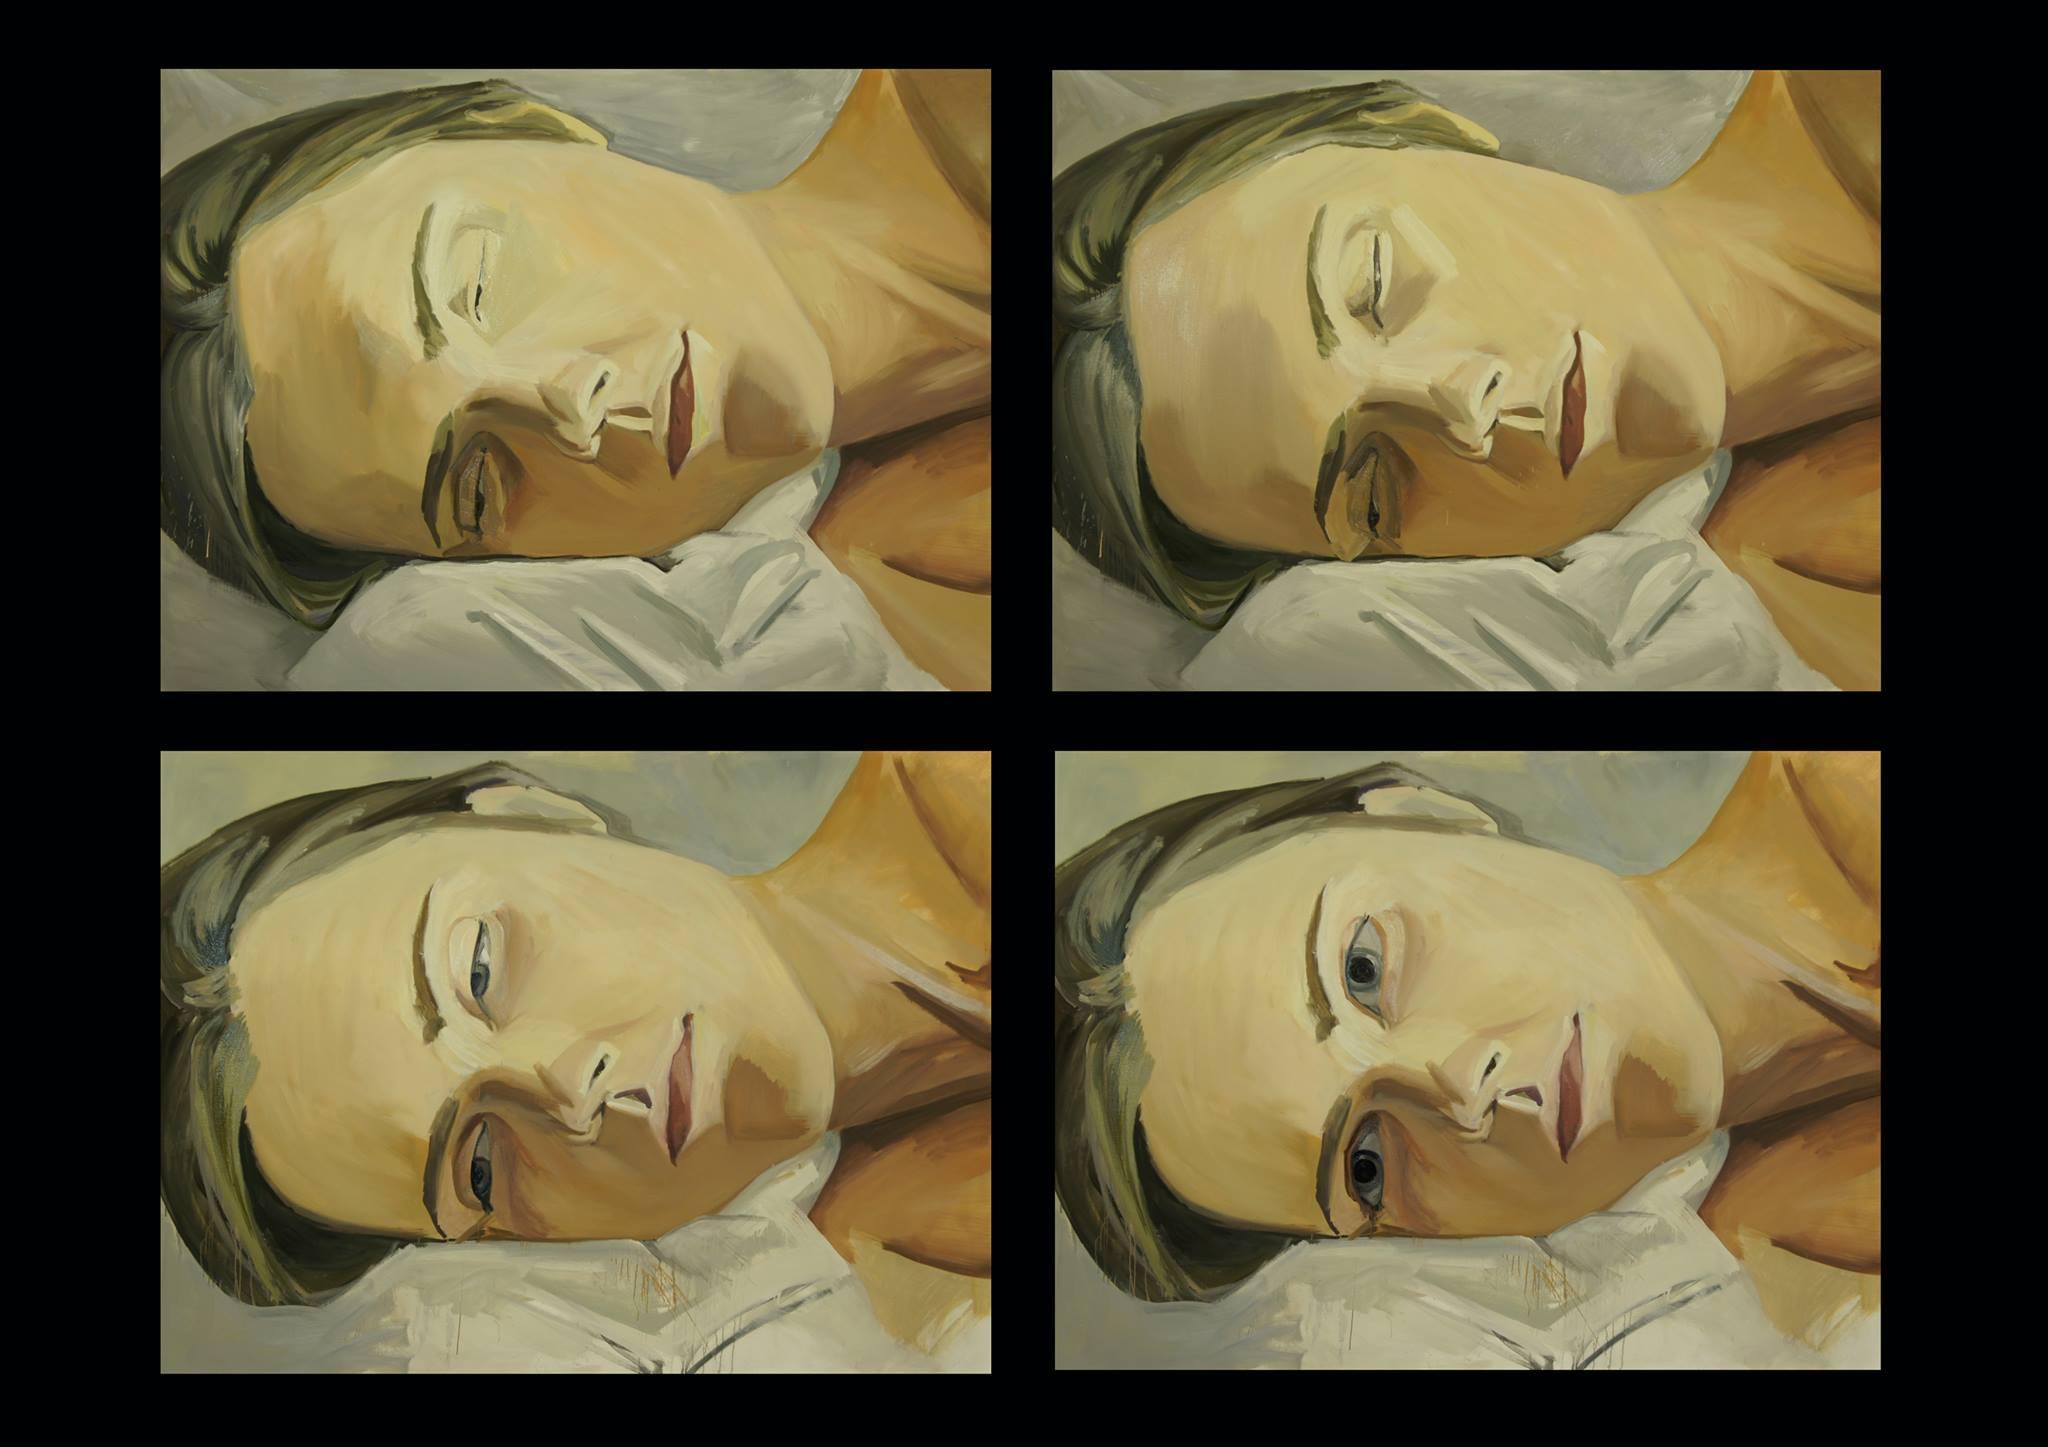 Fragment of artwork, Lesia Khomenko